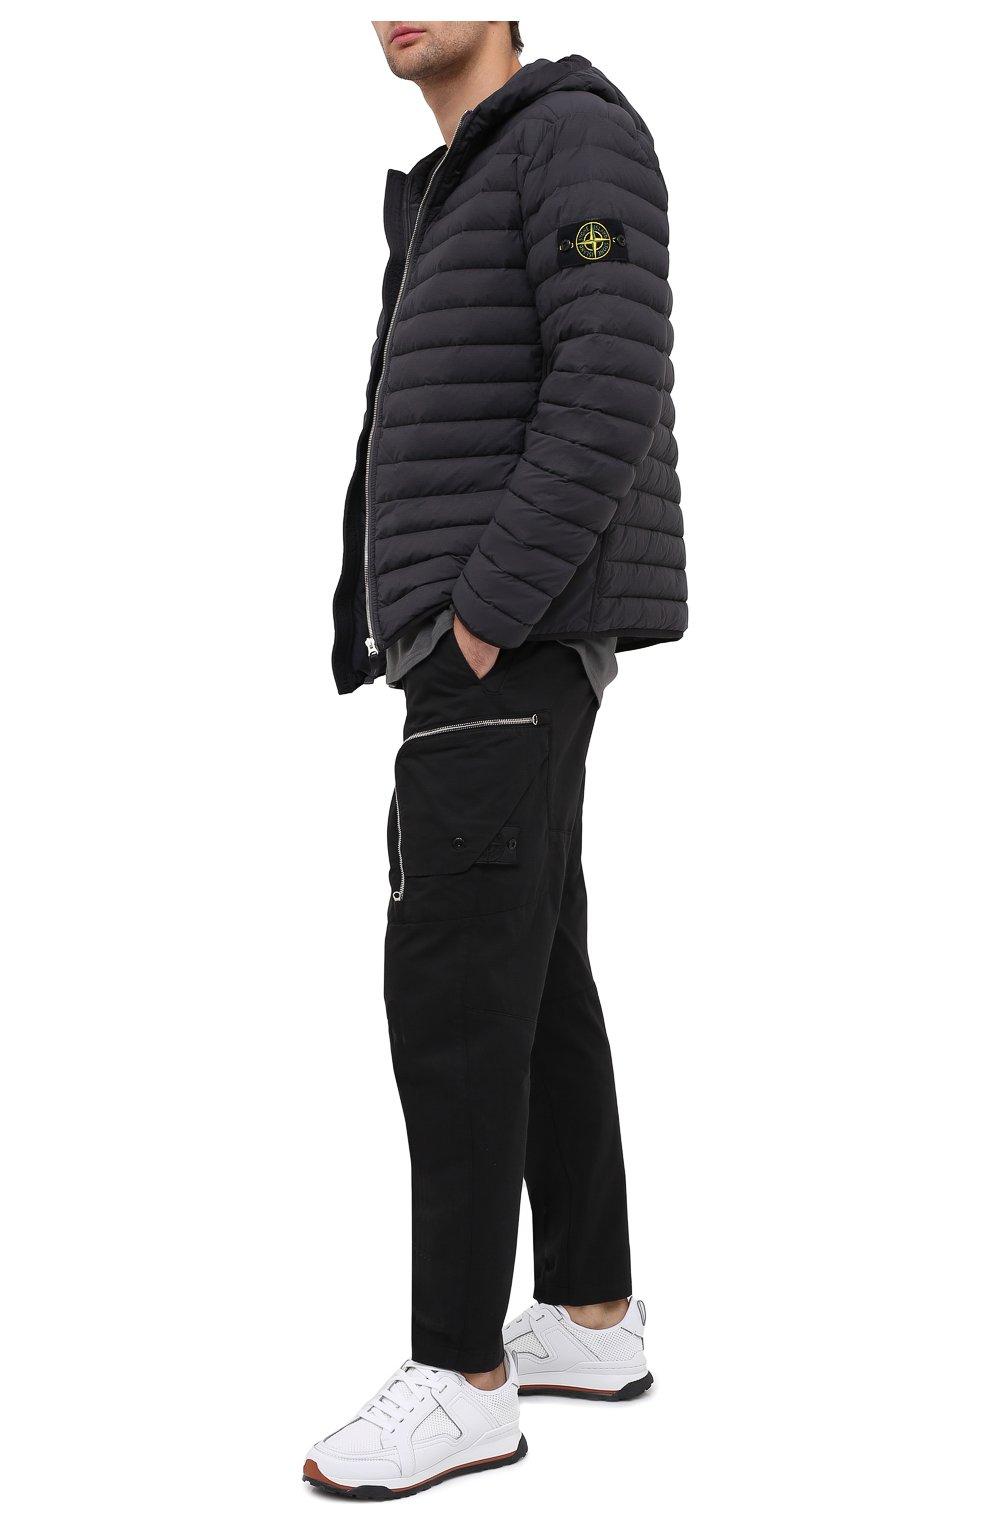 Мужские брюки-карго из хлопка и шерсти STONE ISLAND SHADOW PROJECT черного цвета, арт. 731930508 | Фото 2